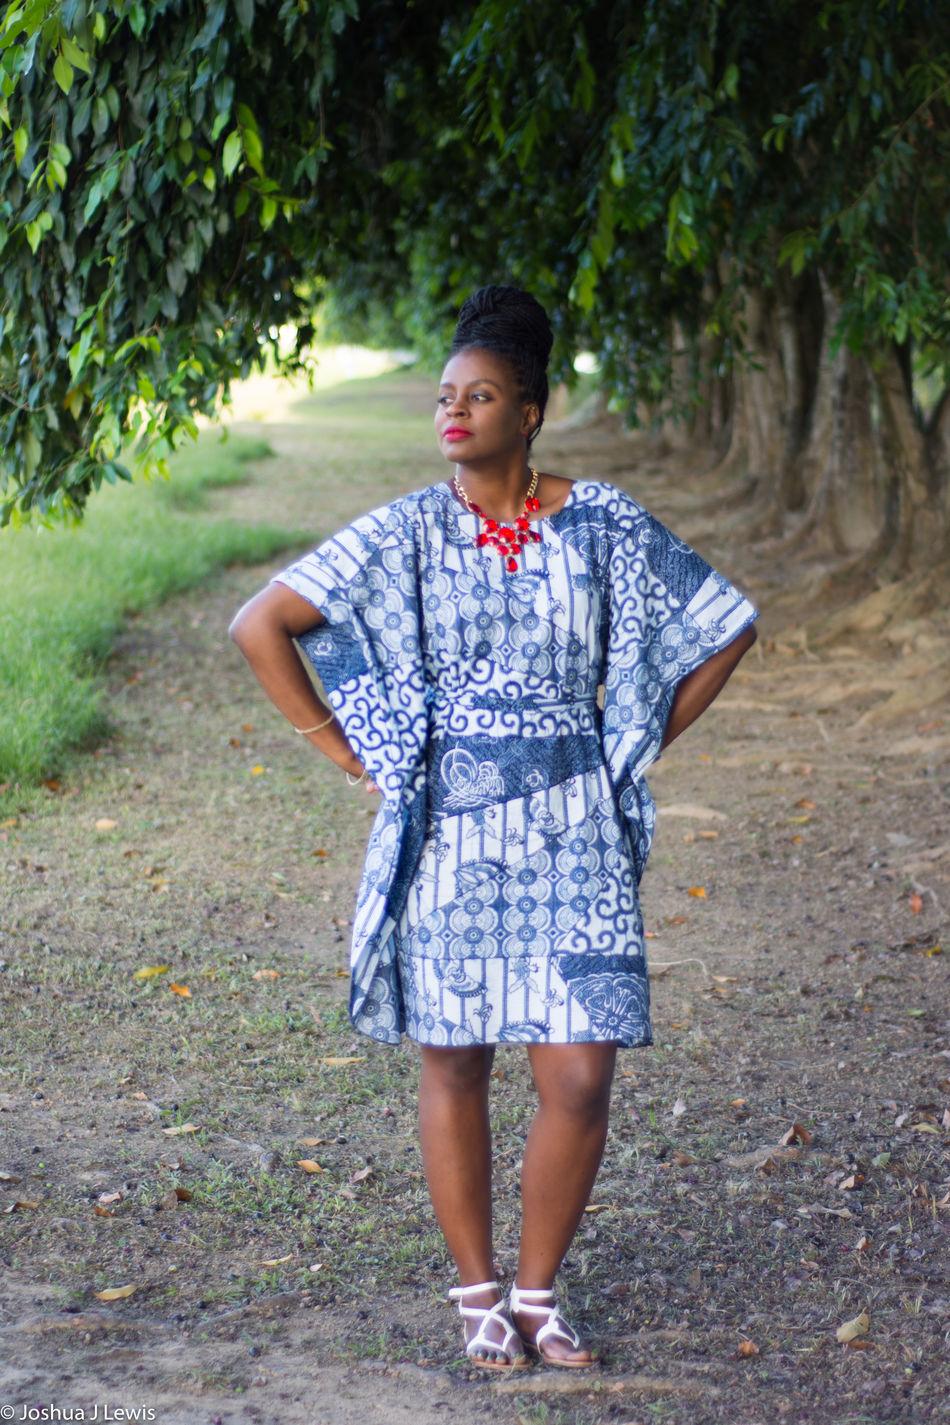 Rastawoman Rastafari Nature Trinidad And Tobago Casual Clothing Caribbean Stillife Beautiful People Beauty In Nature Photoshoot Nature Young Adult Beauty Beautiful Empress Outdoors